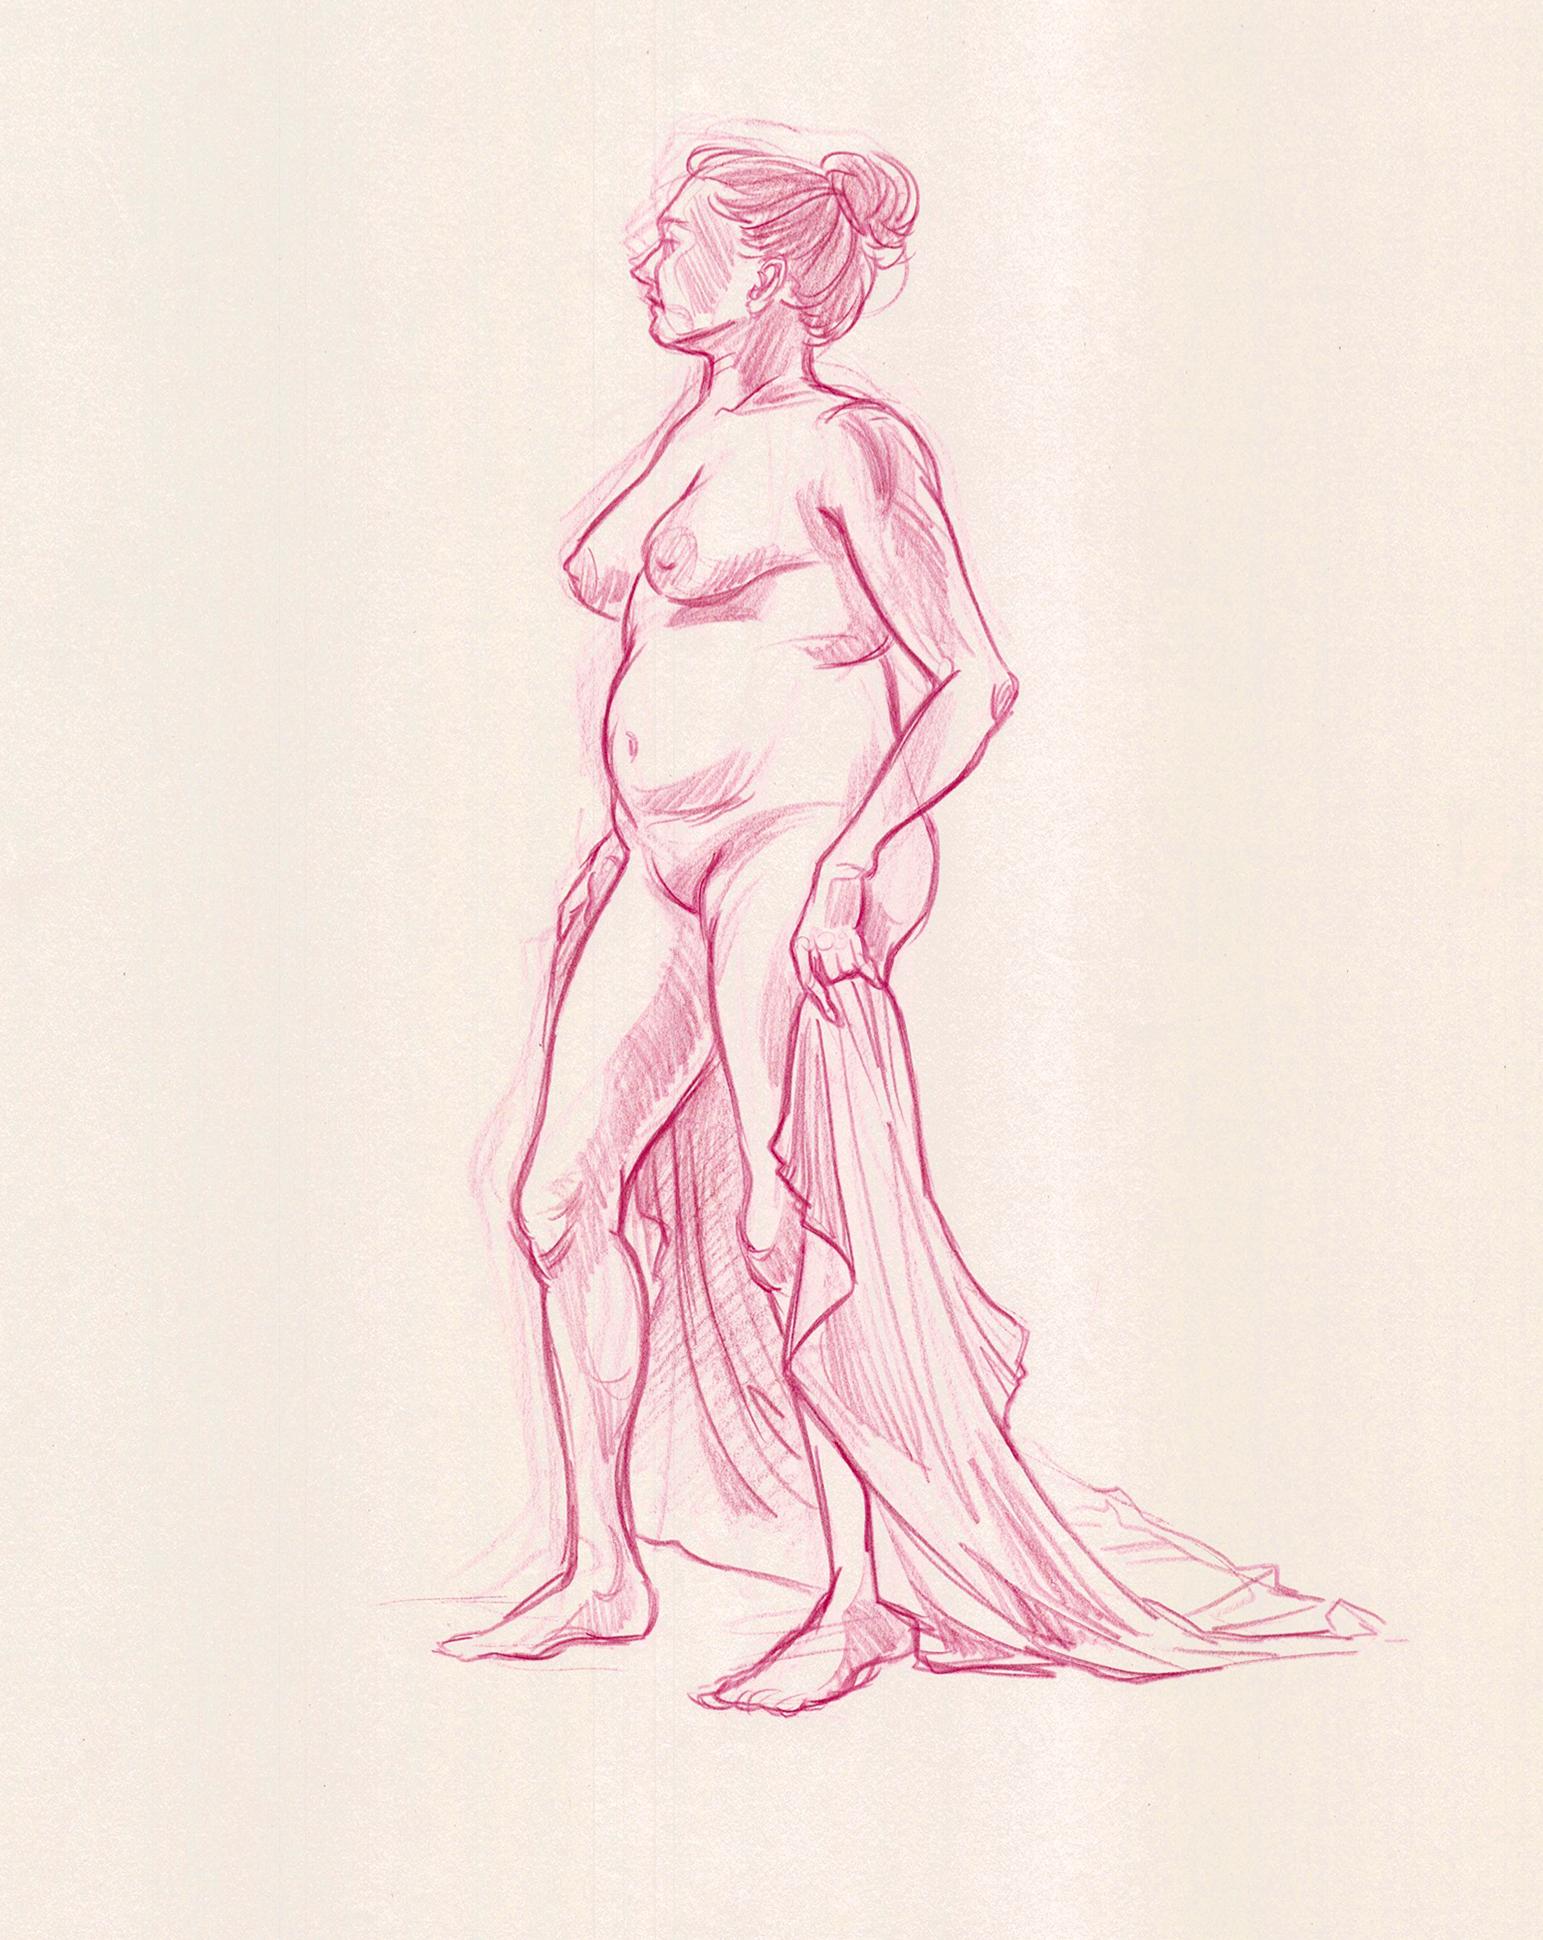 Figure Drawing  Pencil on Newsprint  18 x 24 in.